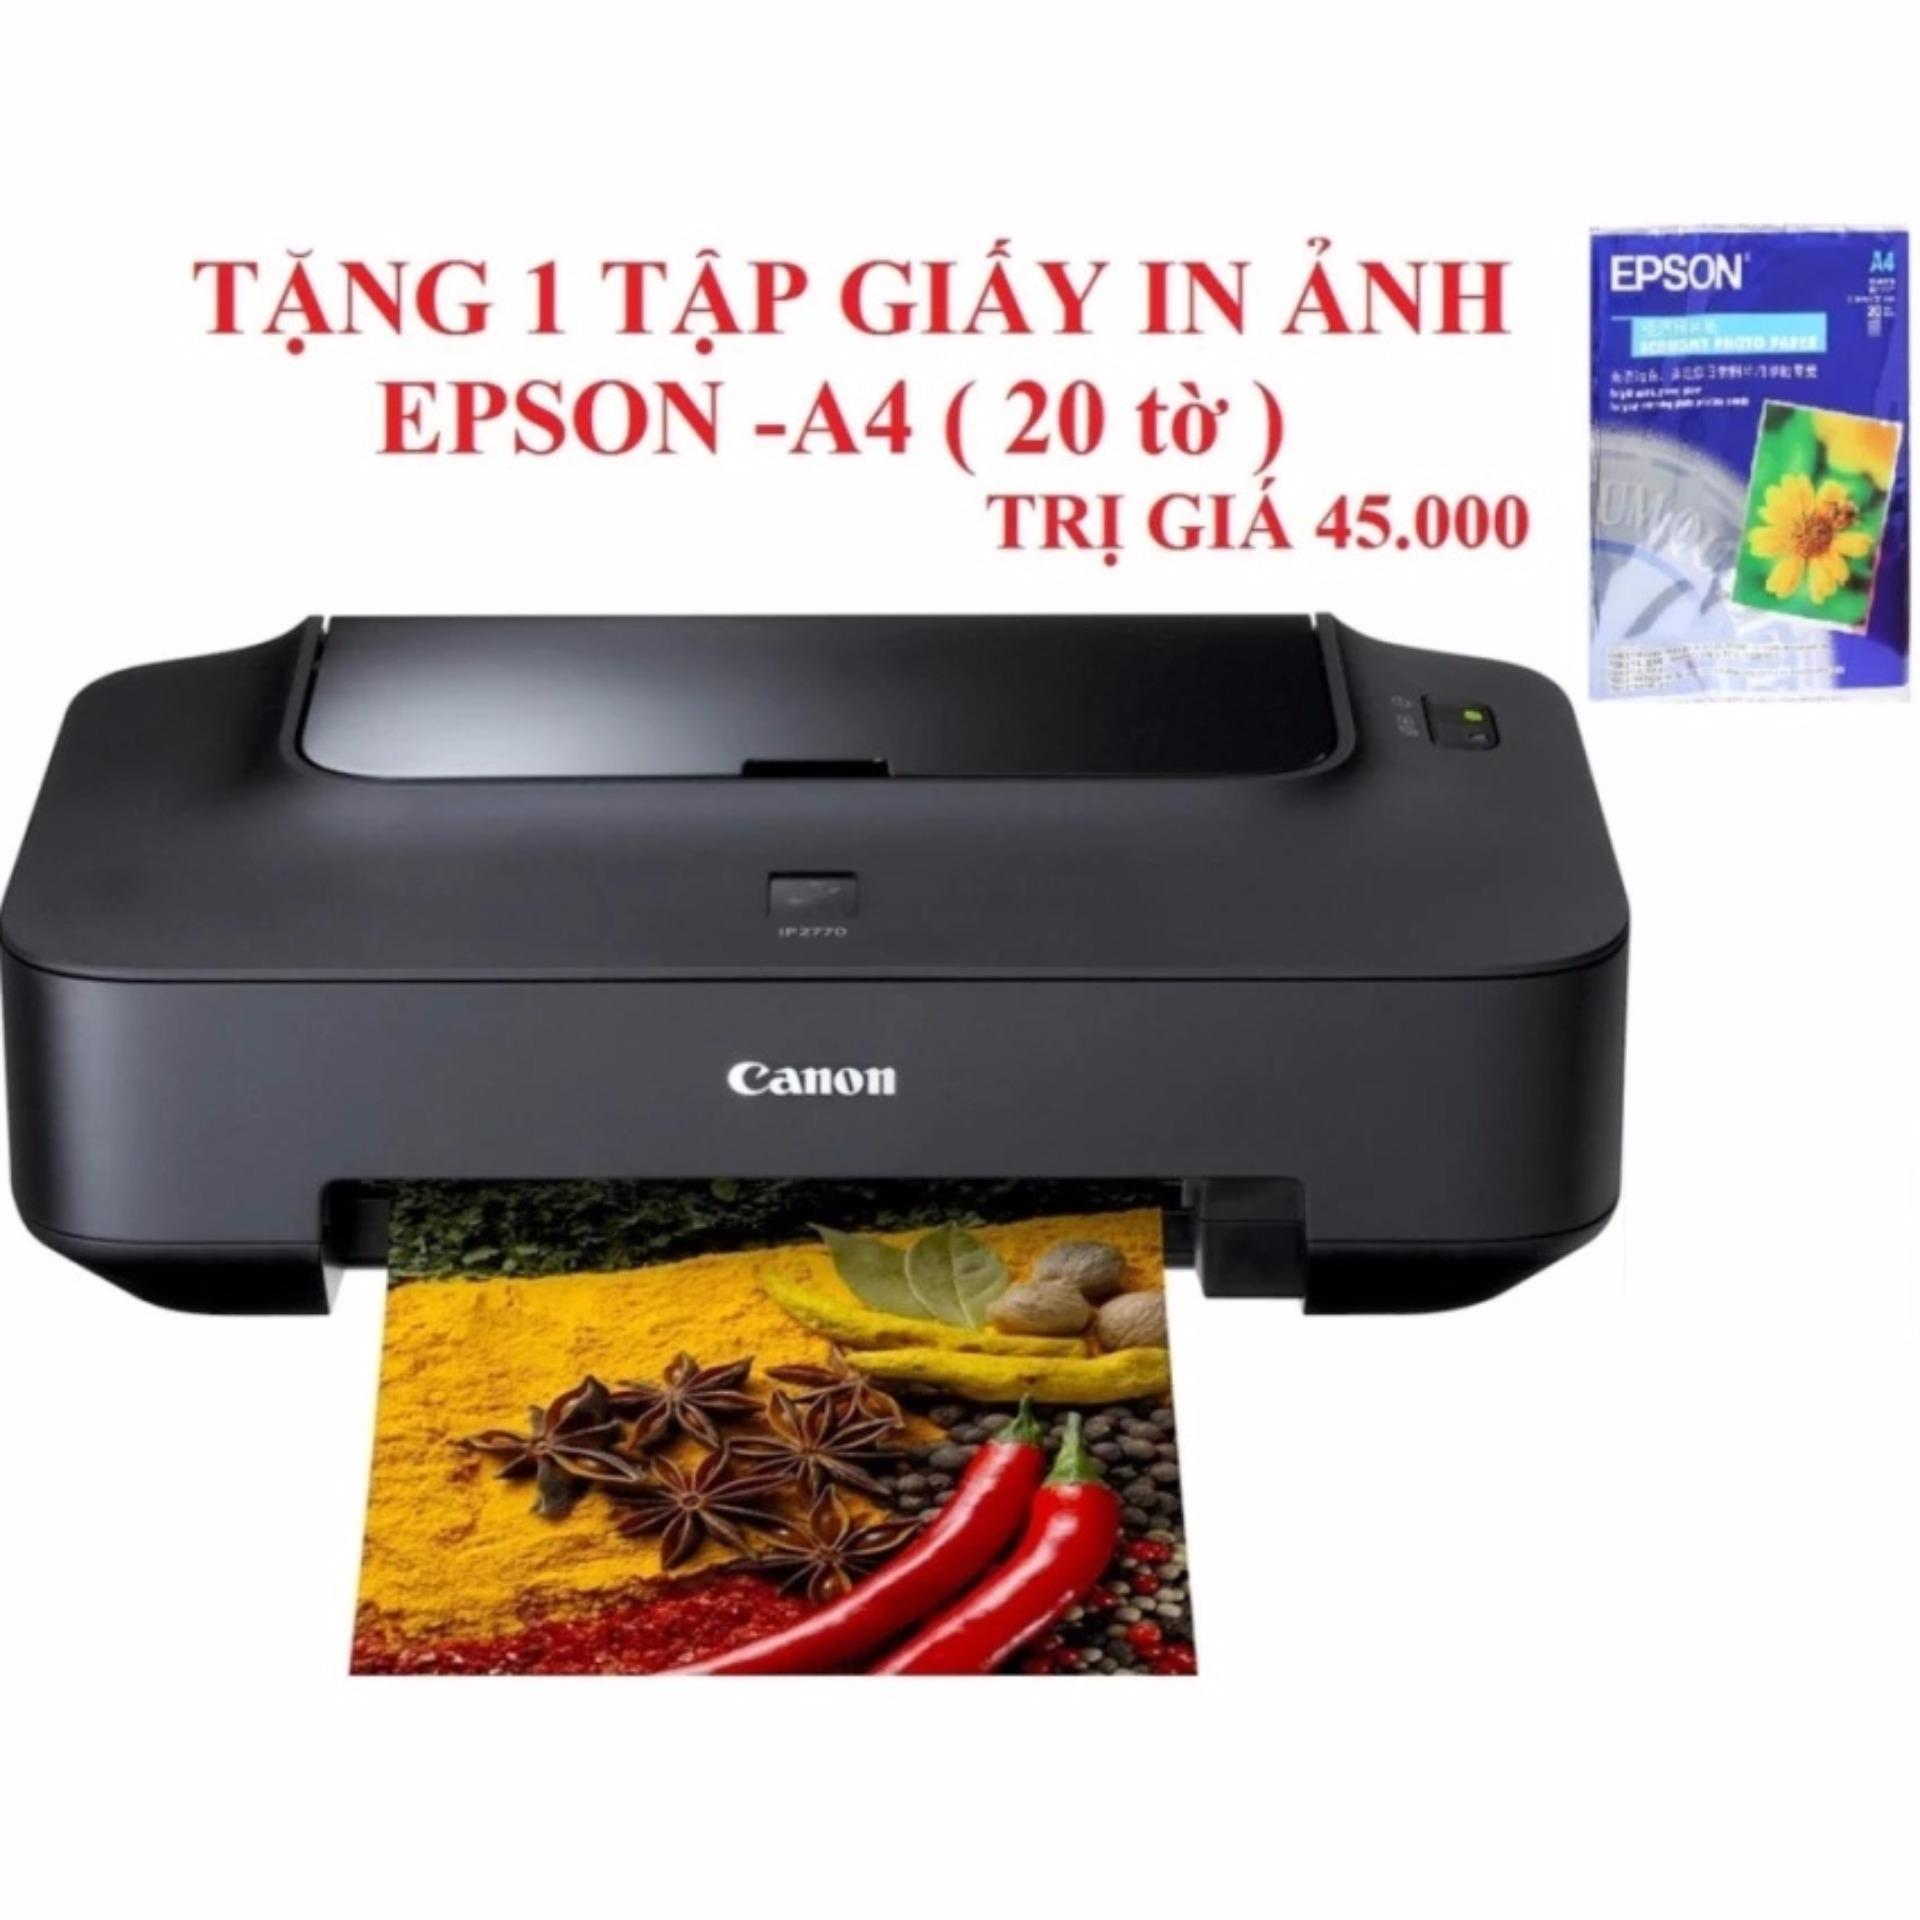 Máy in phun Canon Pixma Ip2770 (Đen) +Tăng 1 tập giấy in Ảnh